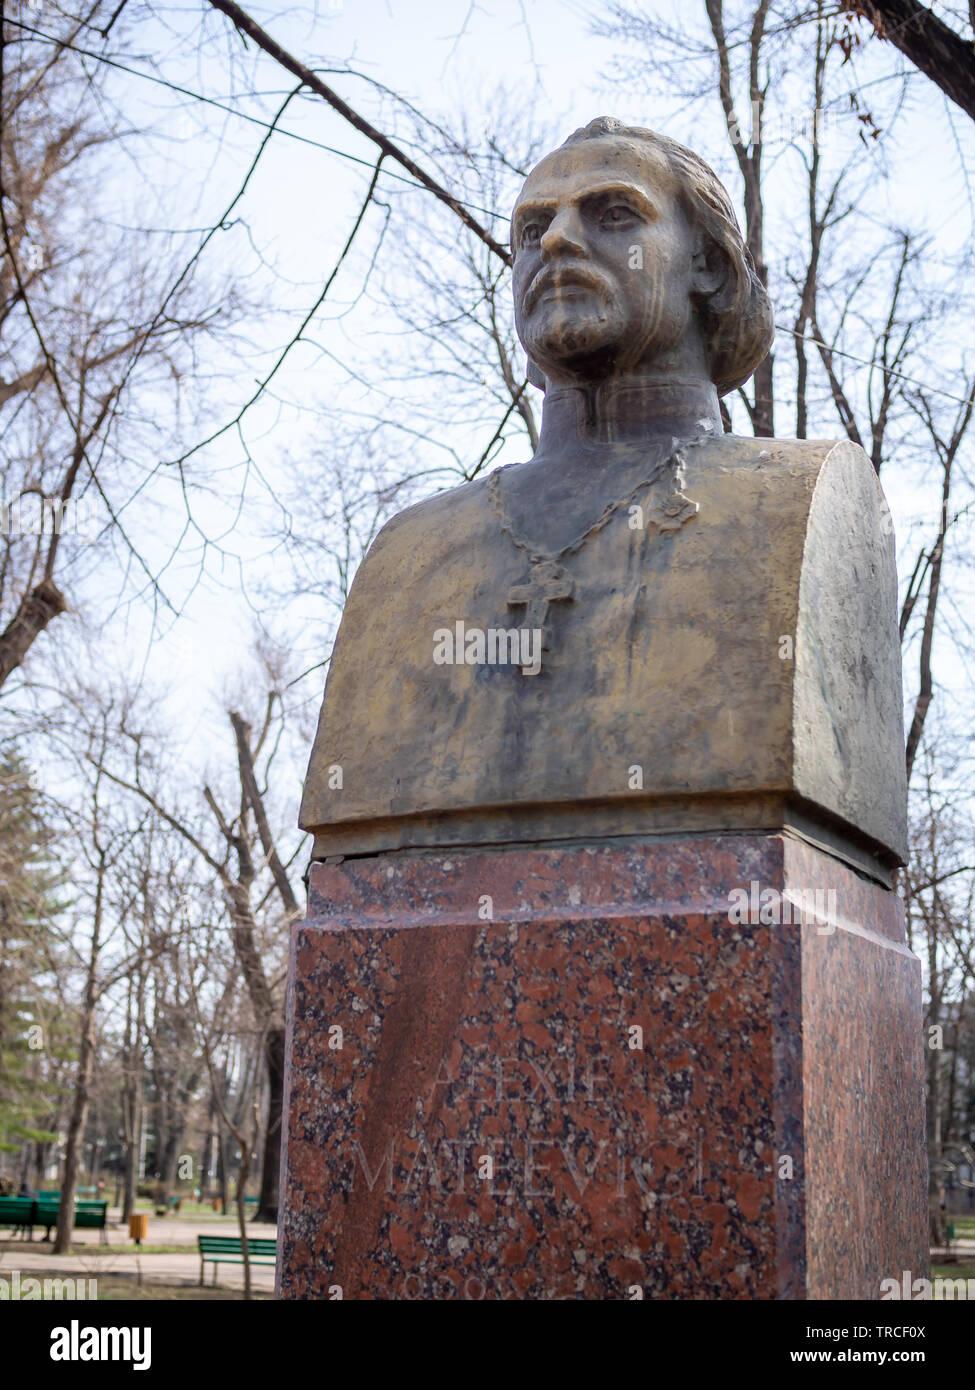 CHISINAU, MOLDOVA-MARCH 21, 2019: Alexei Mateevici bust by Dmitri Rusu-Skvortsov in the Alley of Classics - Stock Image